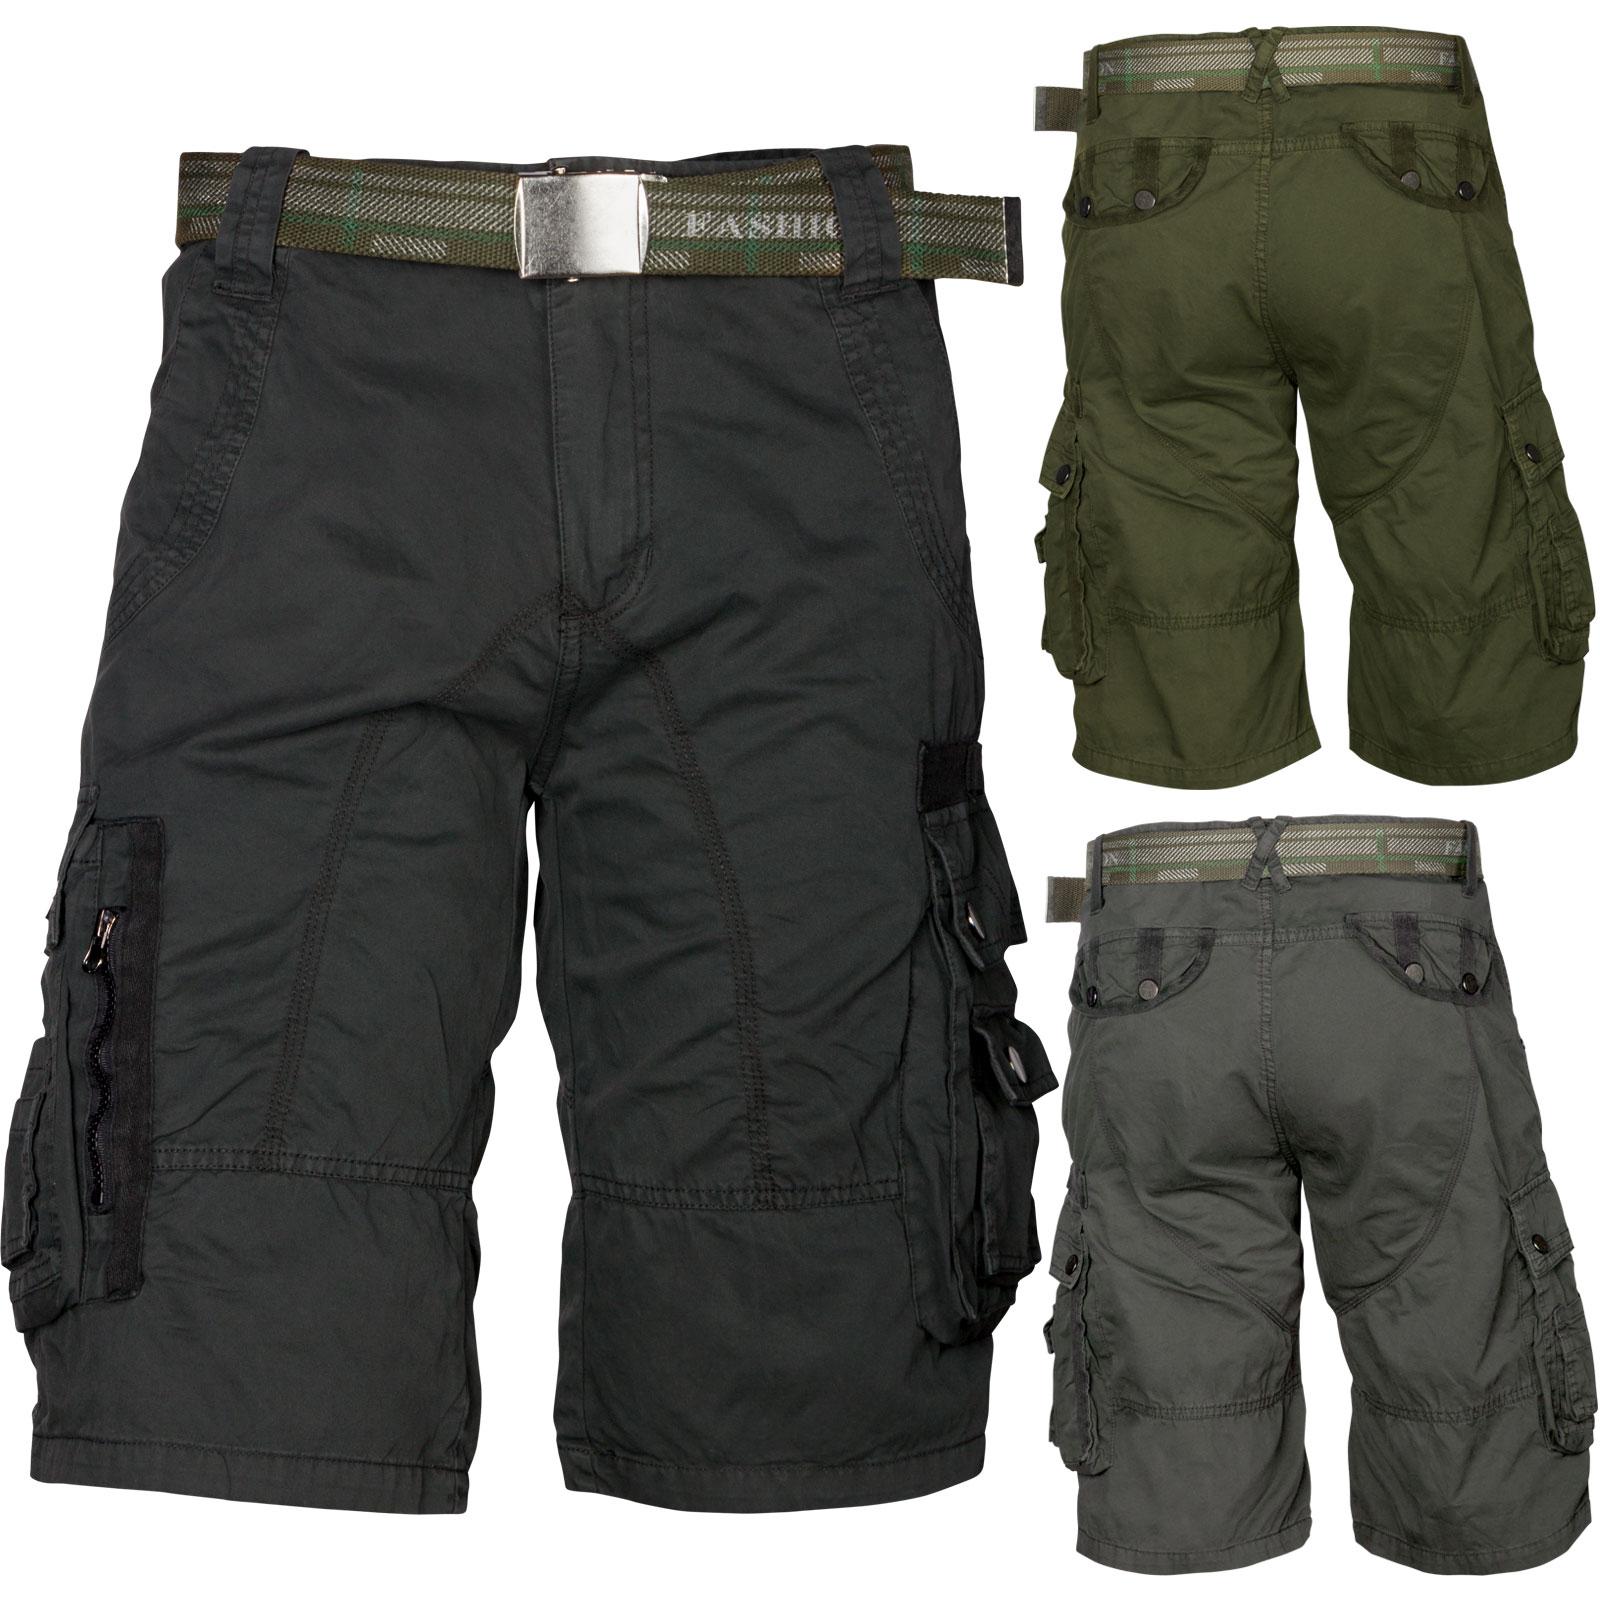 b4b7e6203c392 Trisens Herrenshorts Bermuda Cargo Shorts inkl. Gürtel